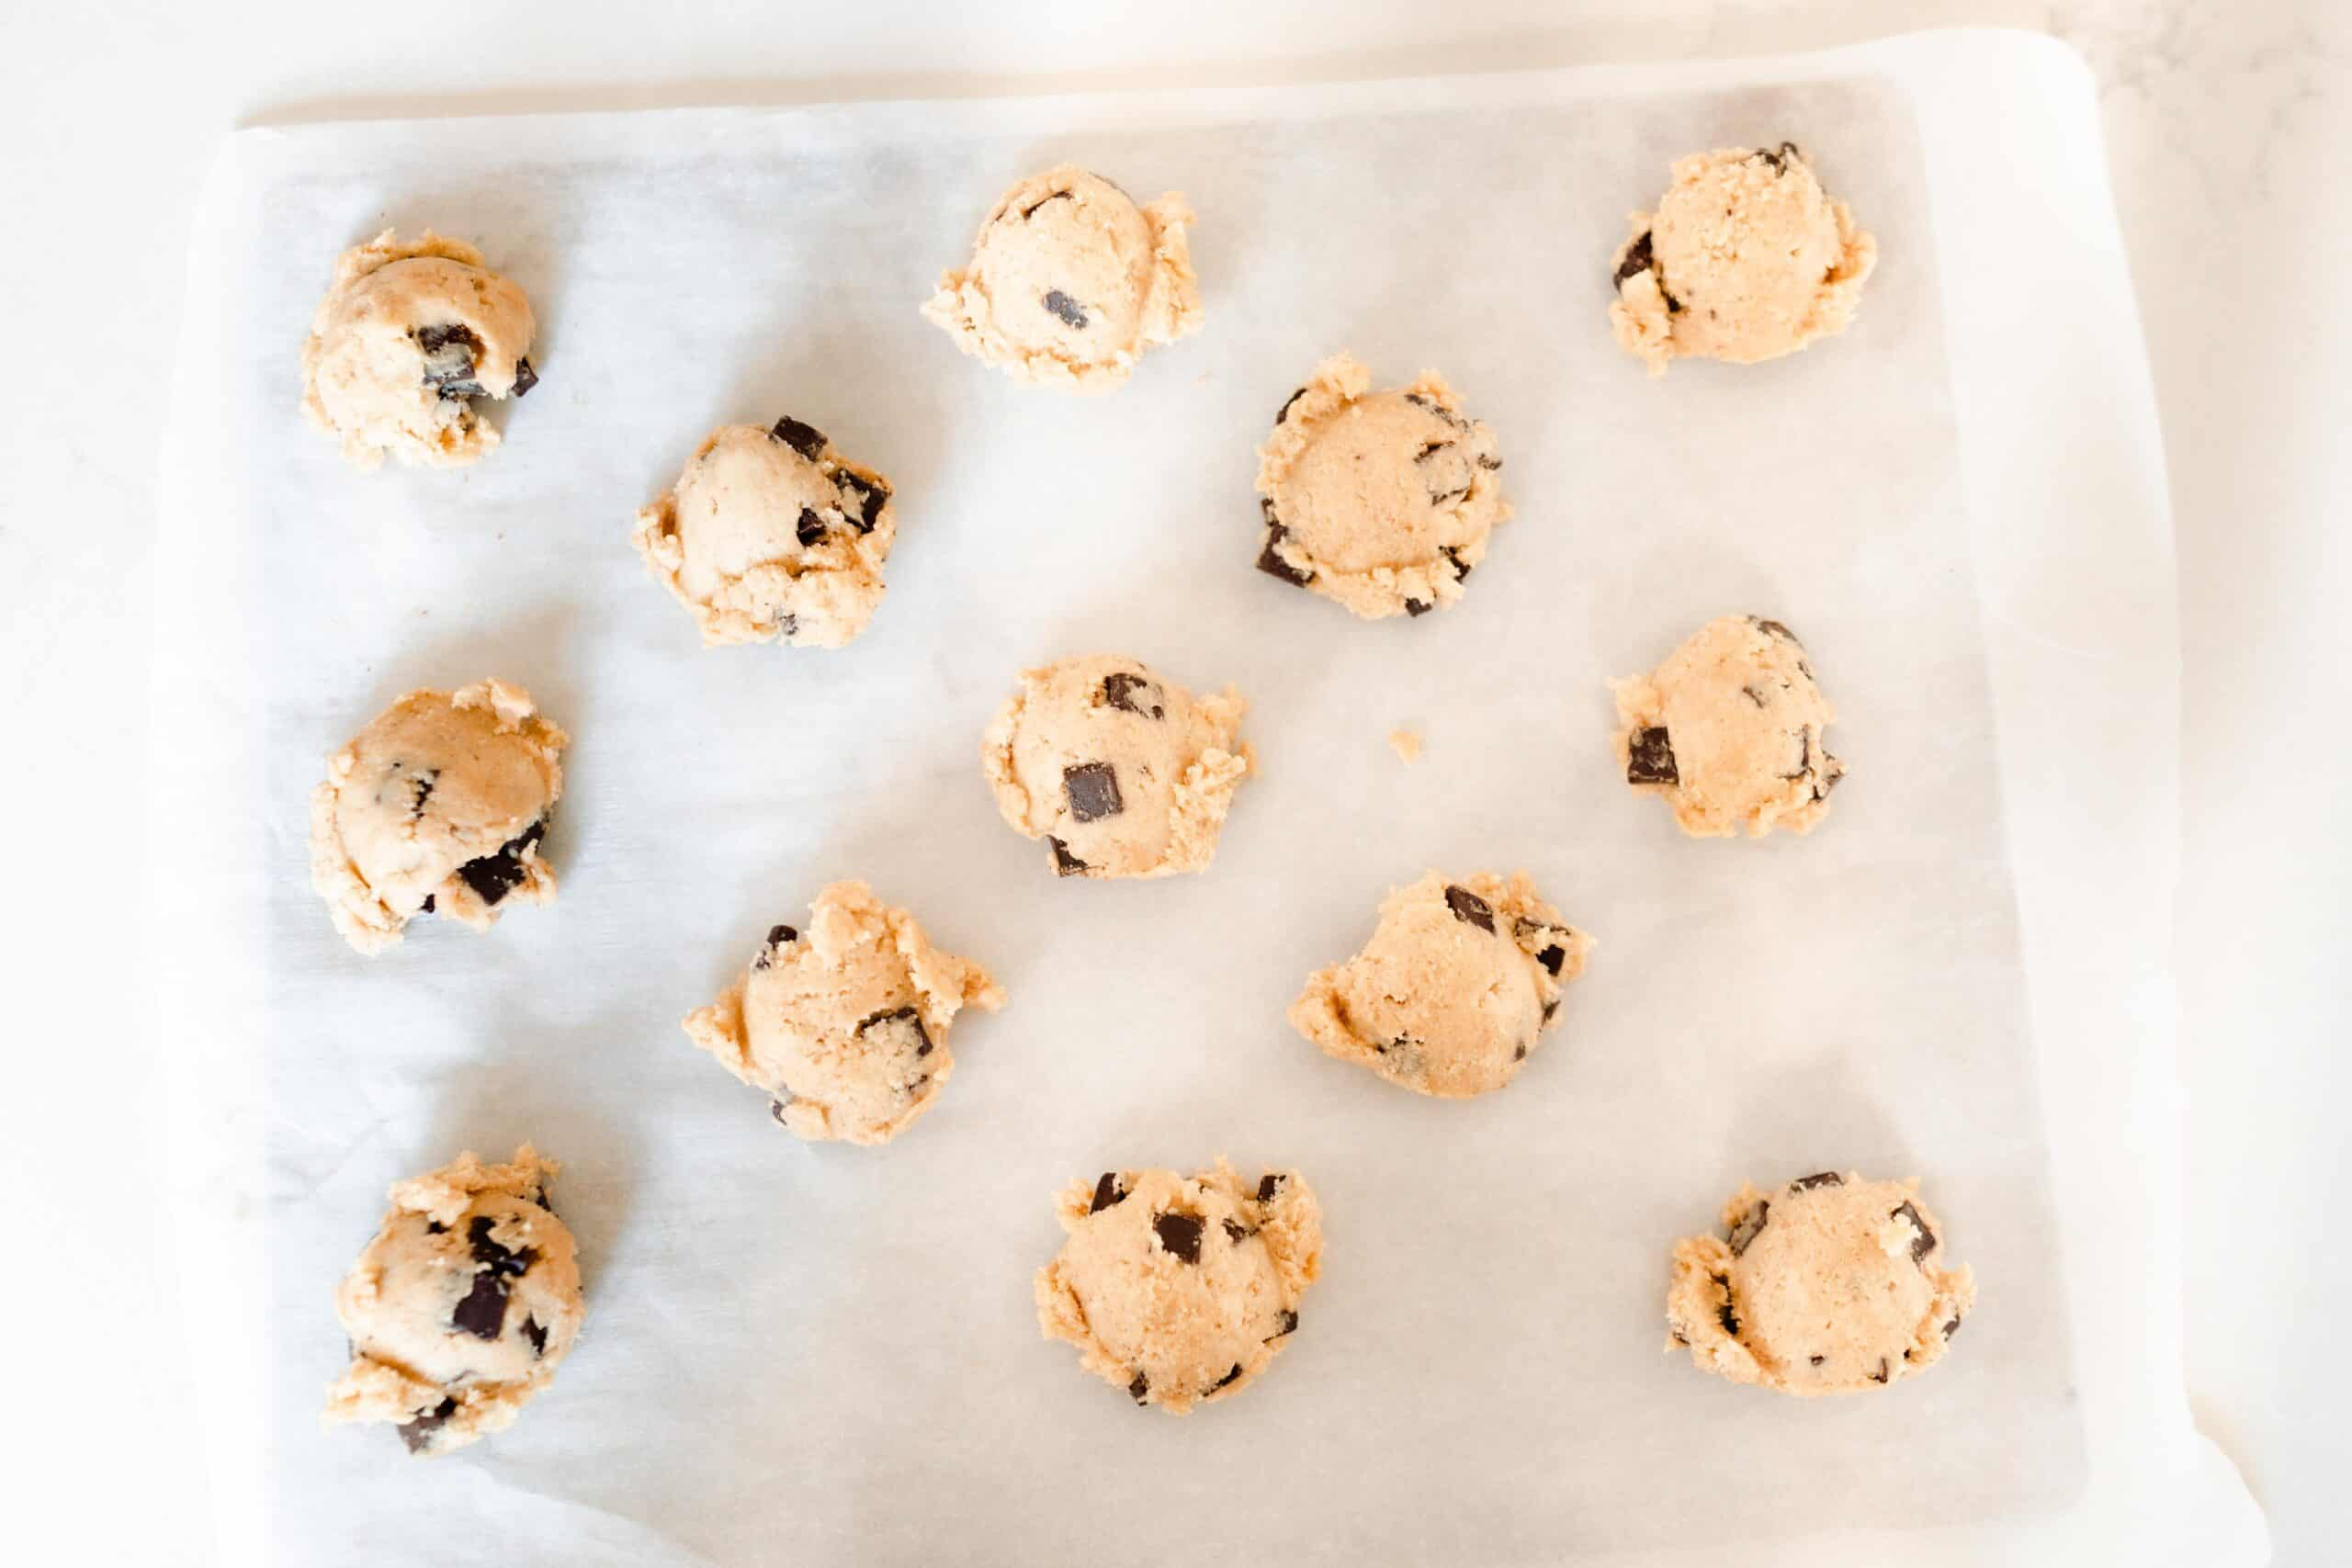 sourdough chocolate chip cookie dough balls on a parchment lined baking sheet